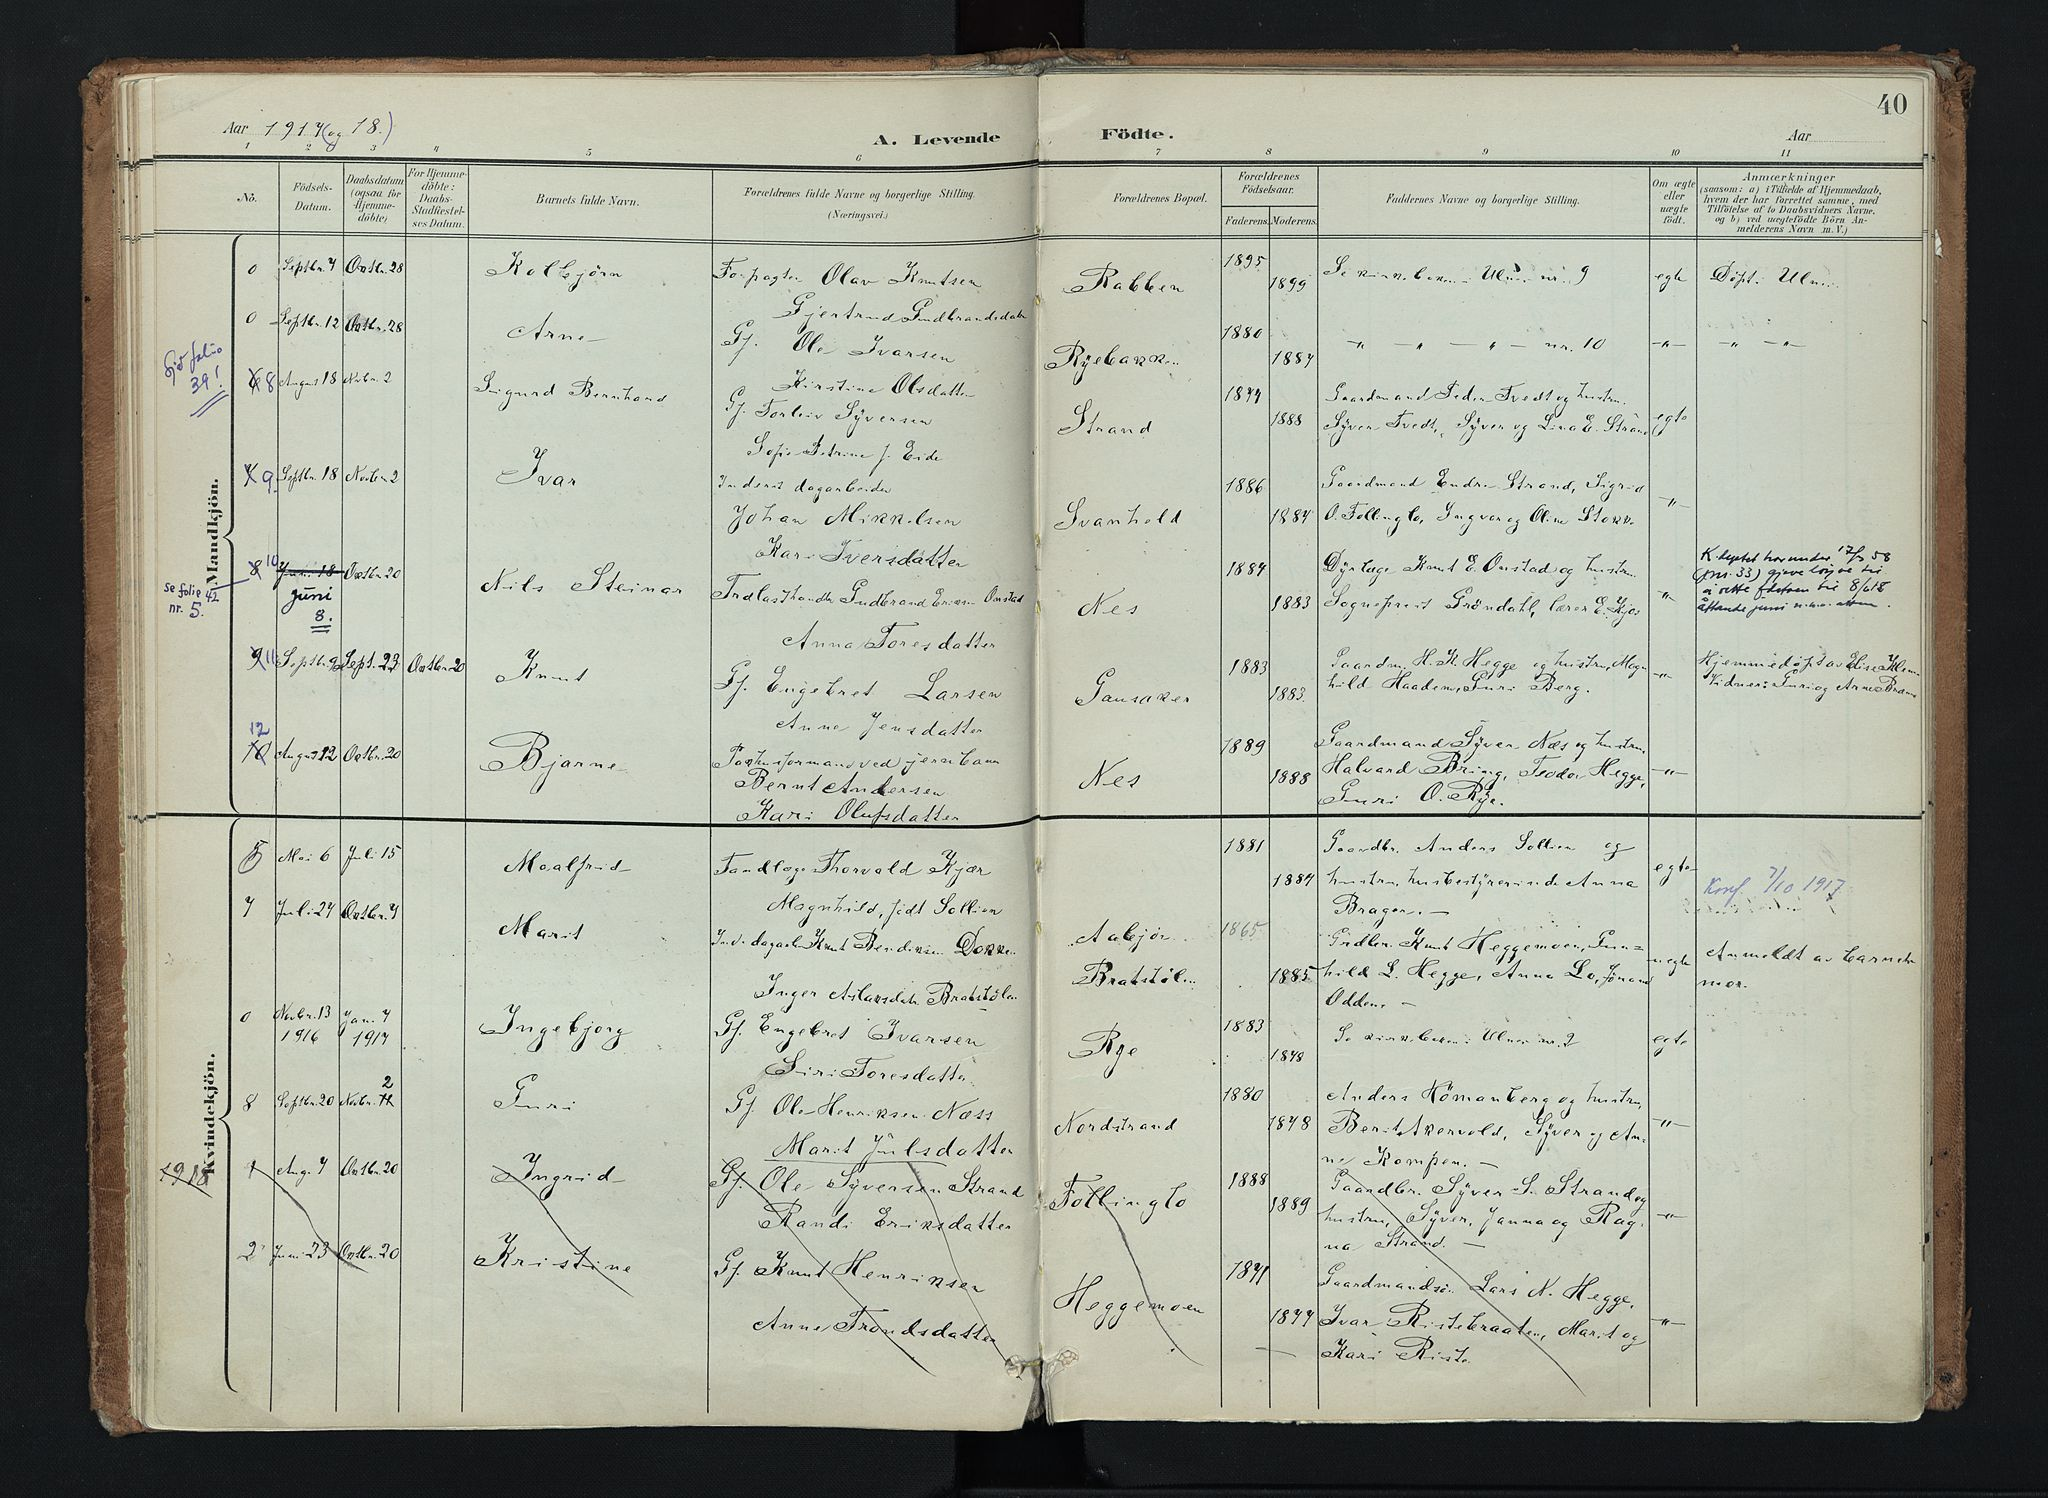 SAH, Nord-Aurdal prestekontor, Ministerialbok nr. 16, 1897-1925, s. 40